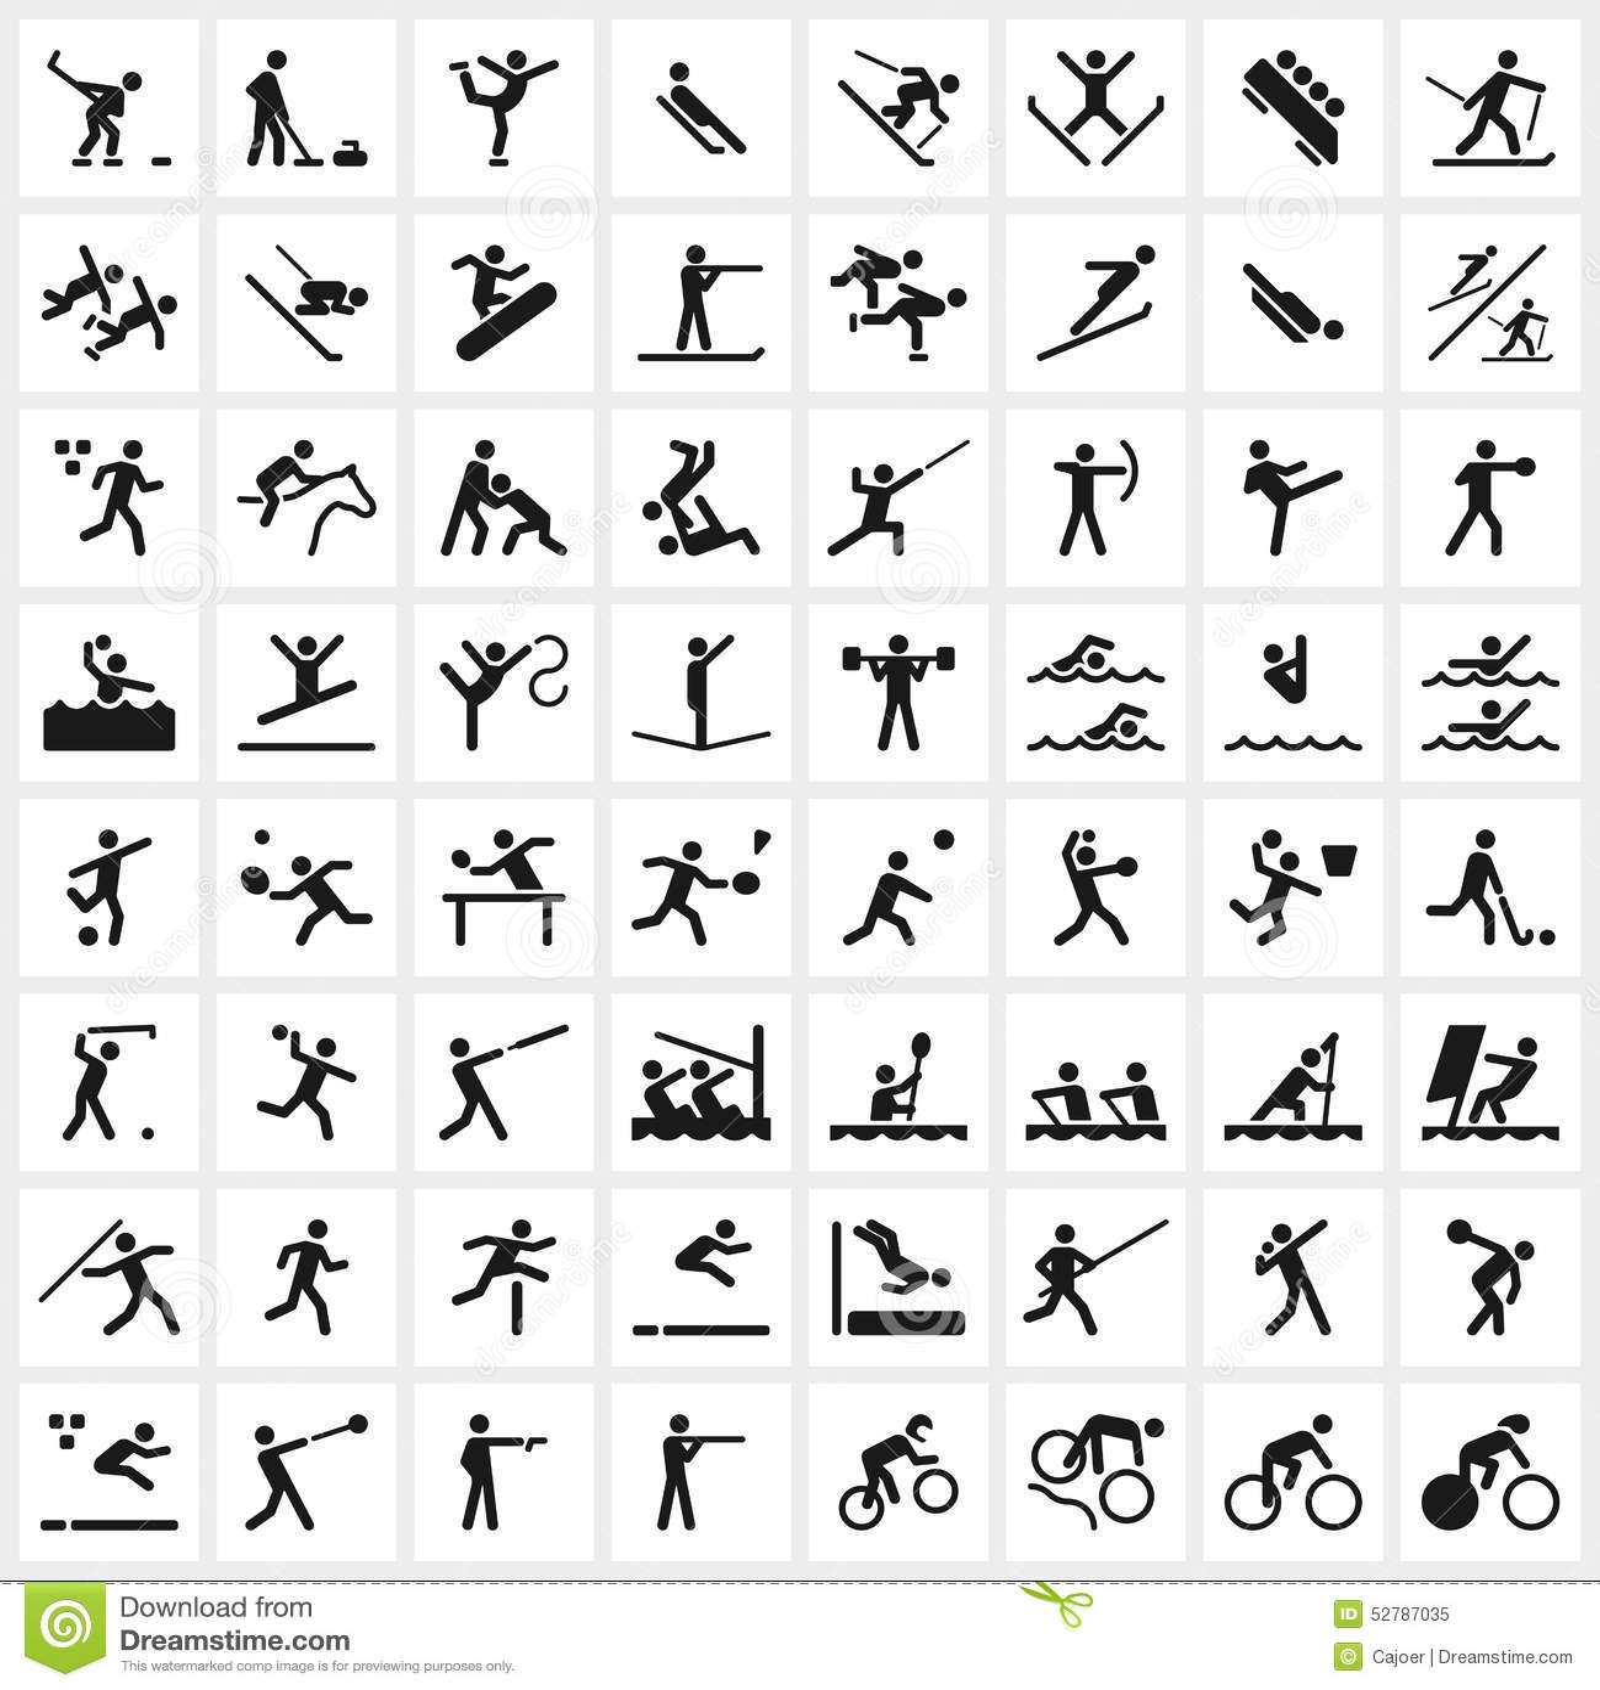 Celtic symbol meaning images symbol and sign ideas symbol meaning son celtic symbol meaning son buycottarizona biocorpaavc